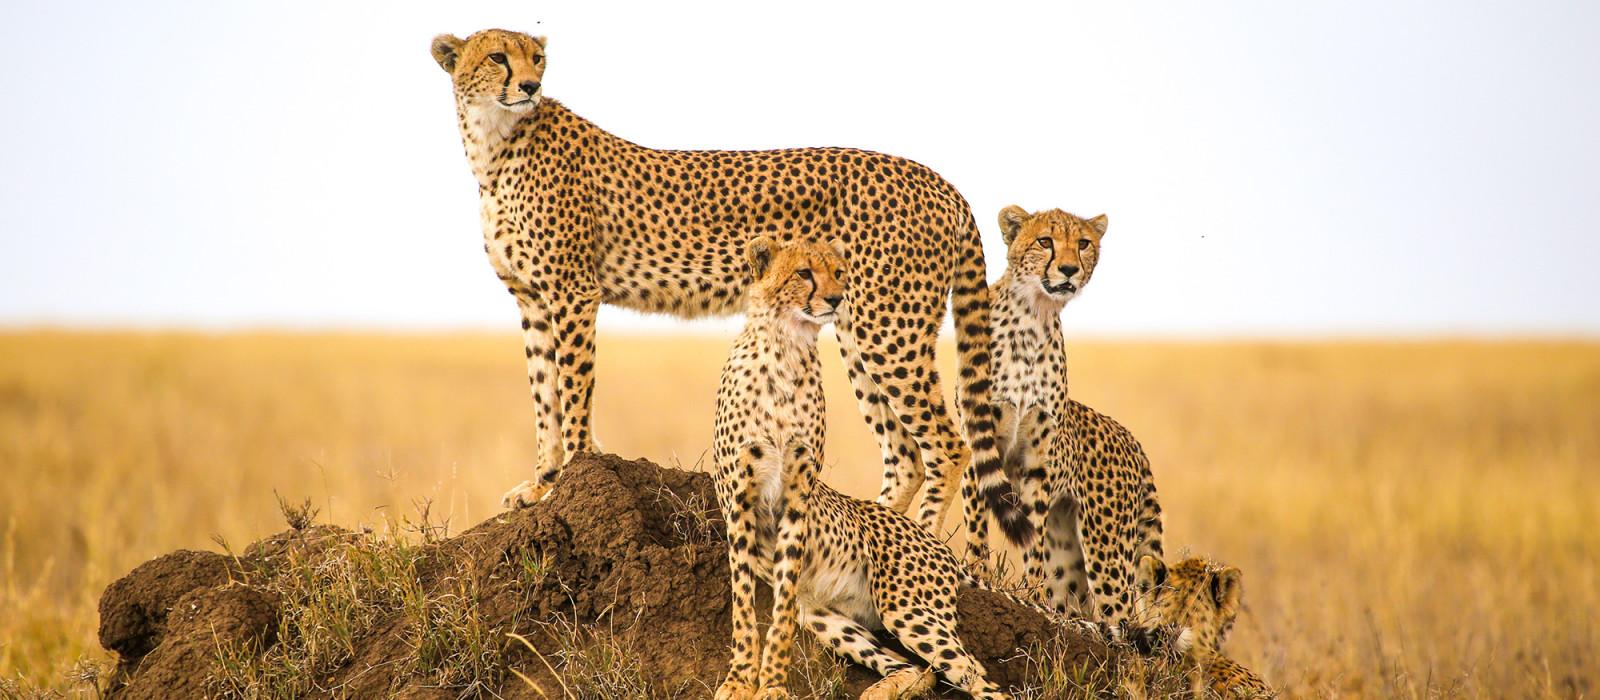 Tansania: Safari & authentische Einblicke Urlaub 1